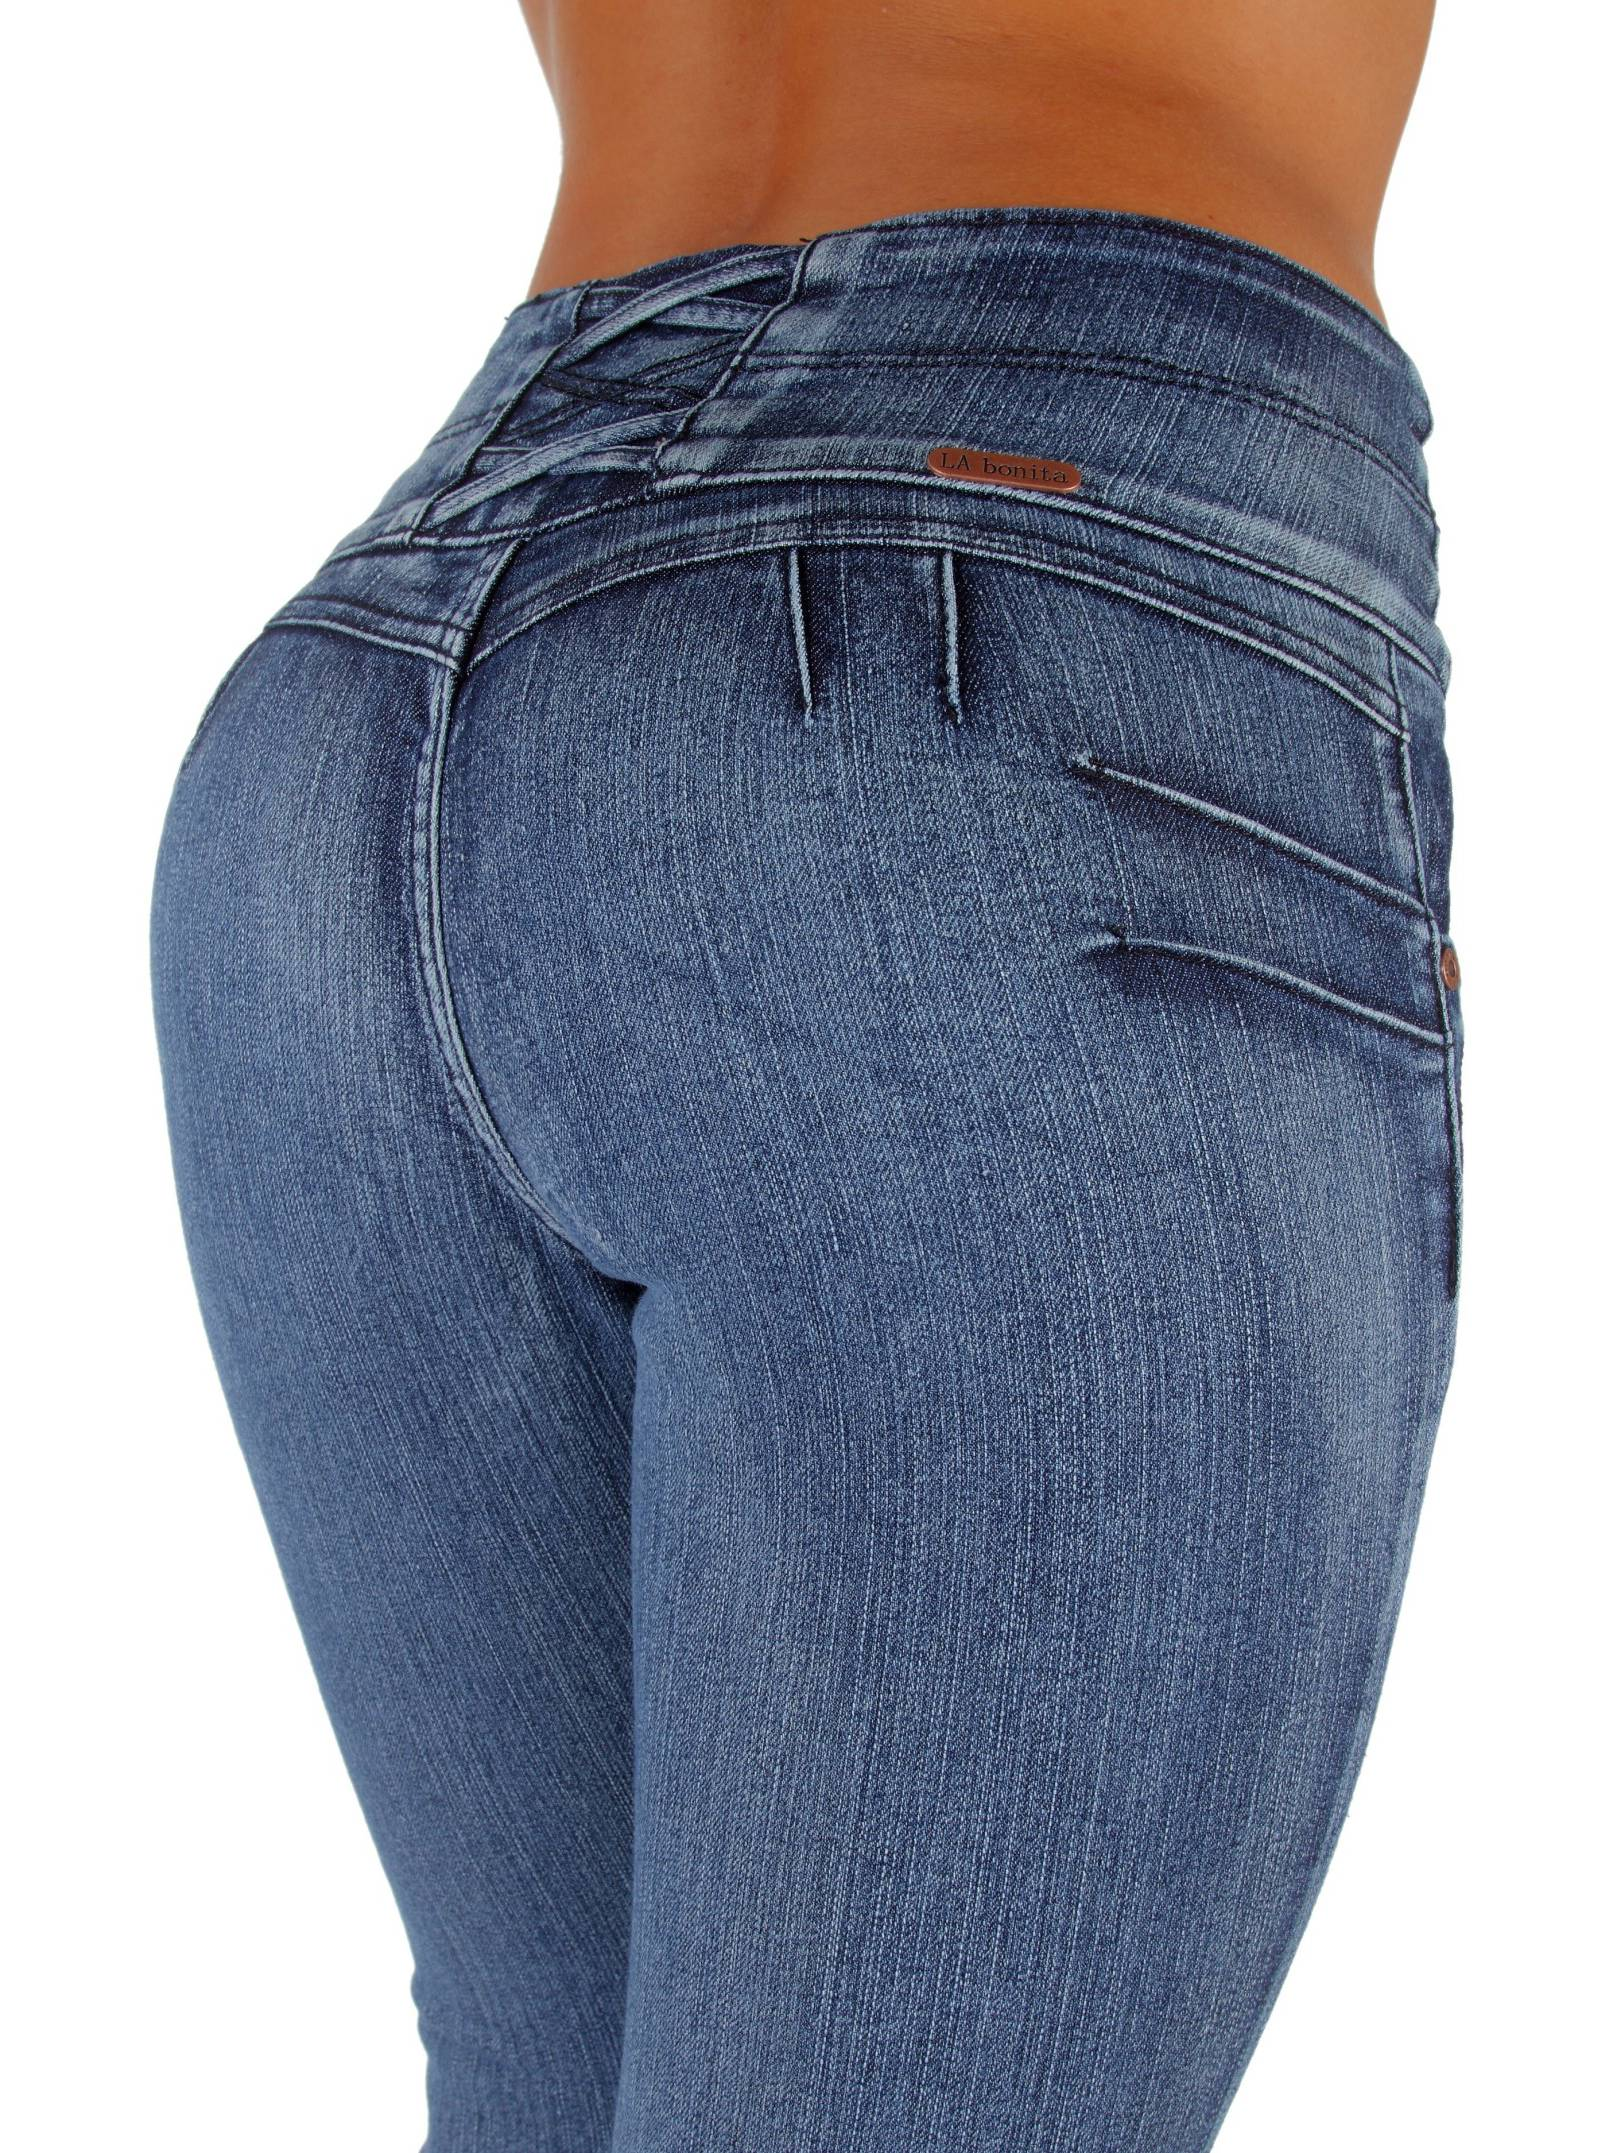 Style LA7A033S - Colombian Design, Mid Waist, Butt Lift, Skinny Jeans